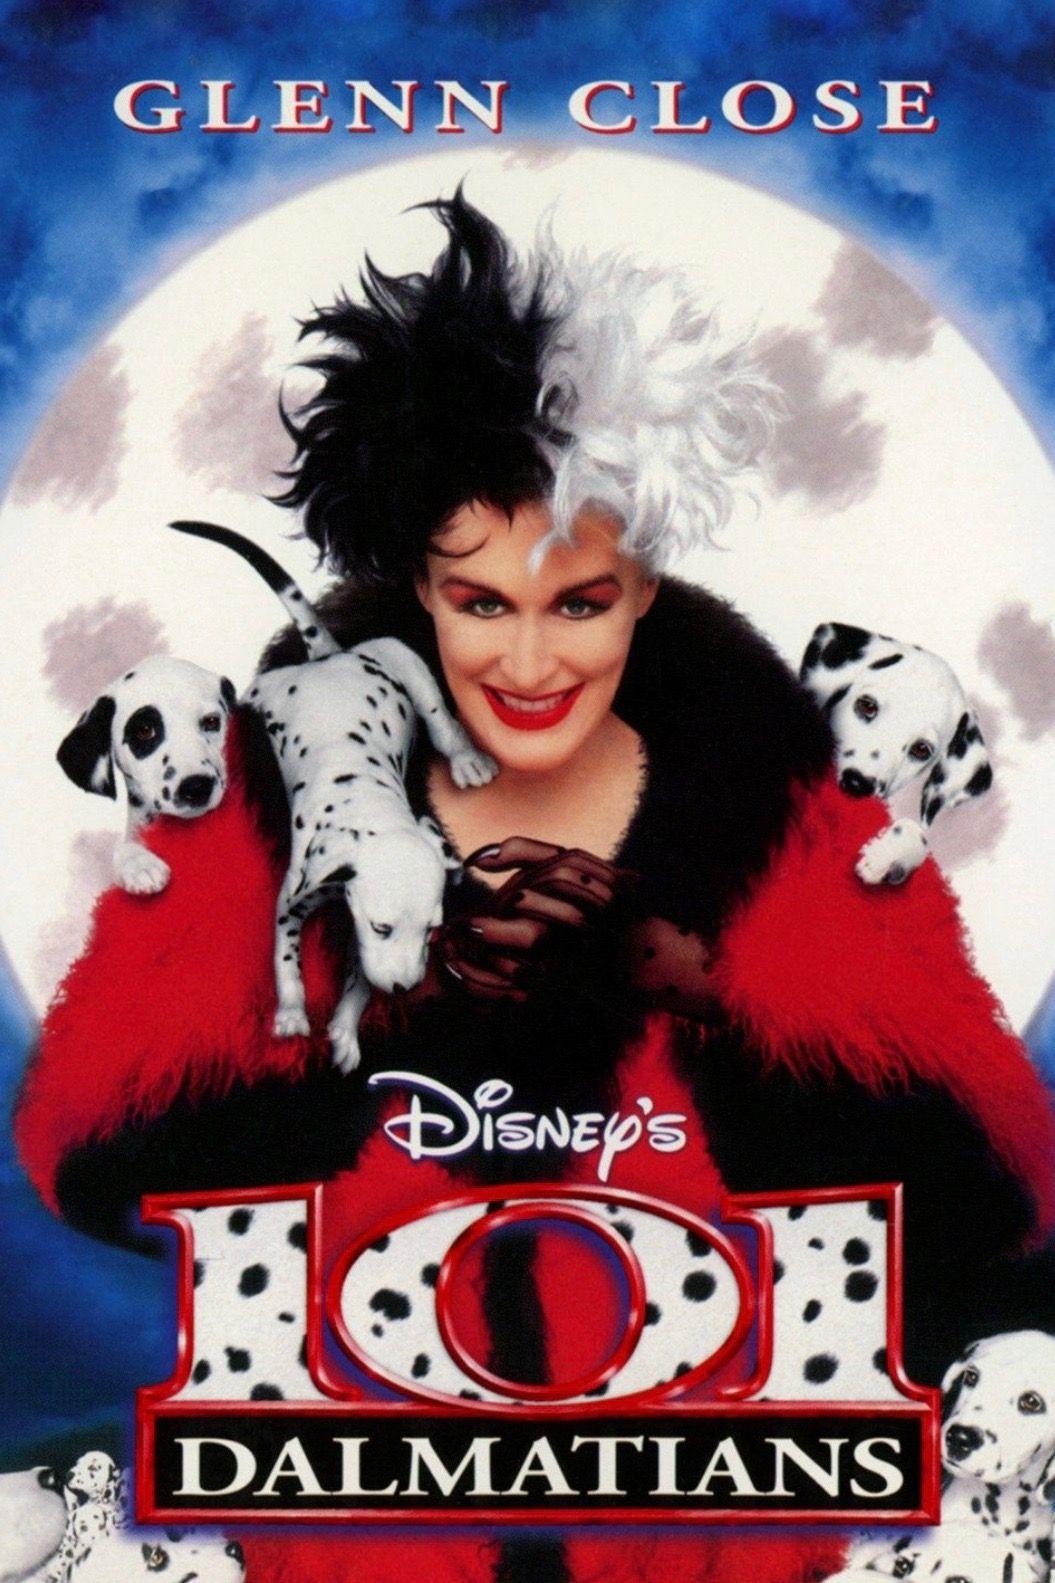 101 Dalmatians 1996 Films Complets Film Complet En Francais Film Streaming